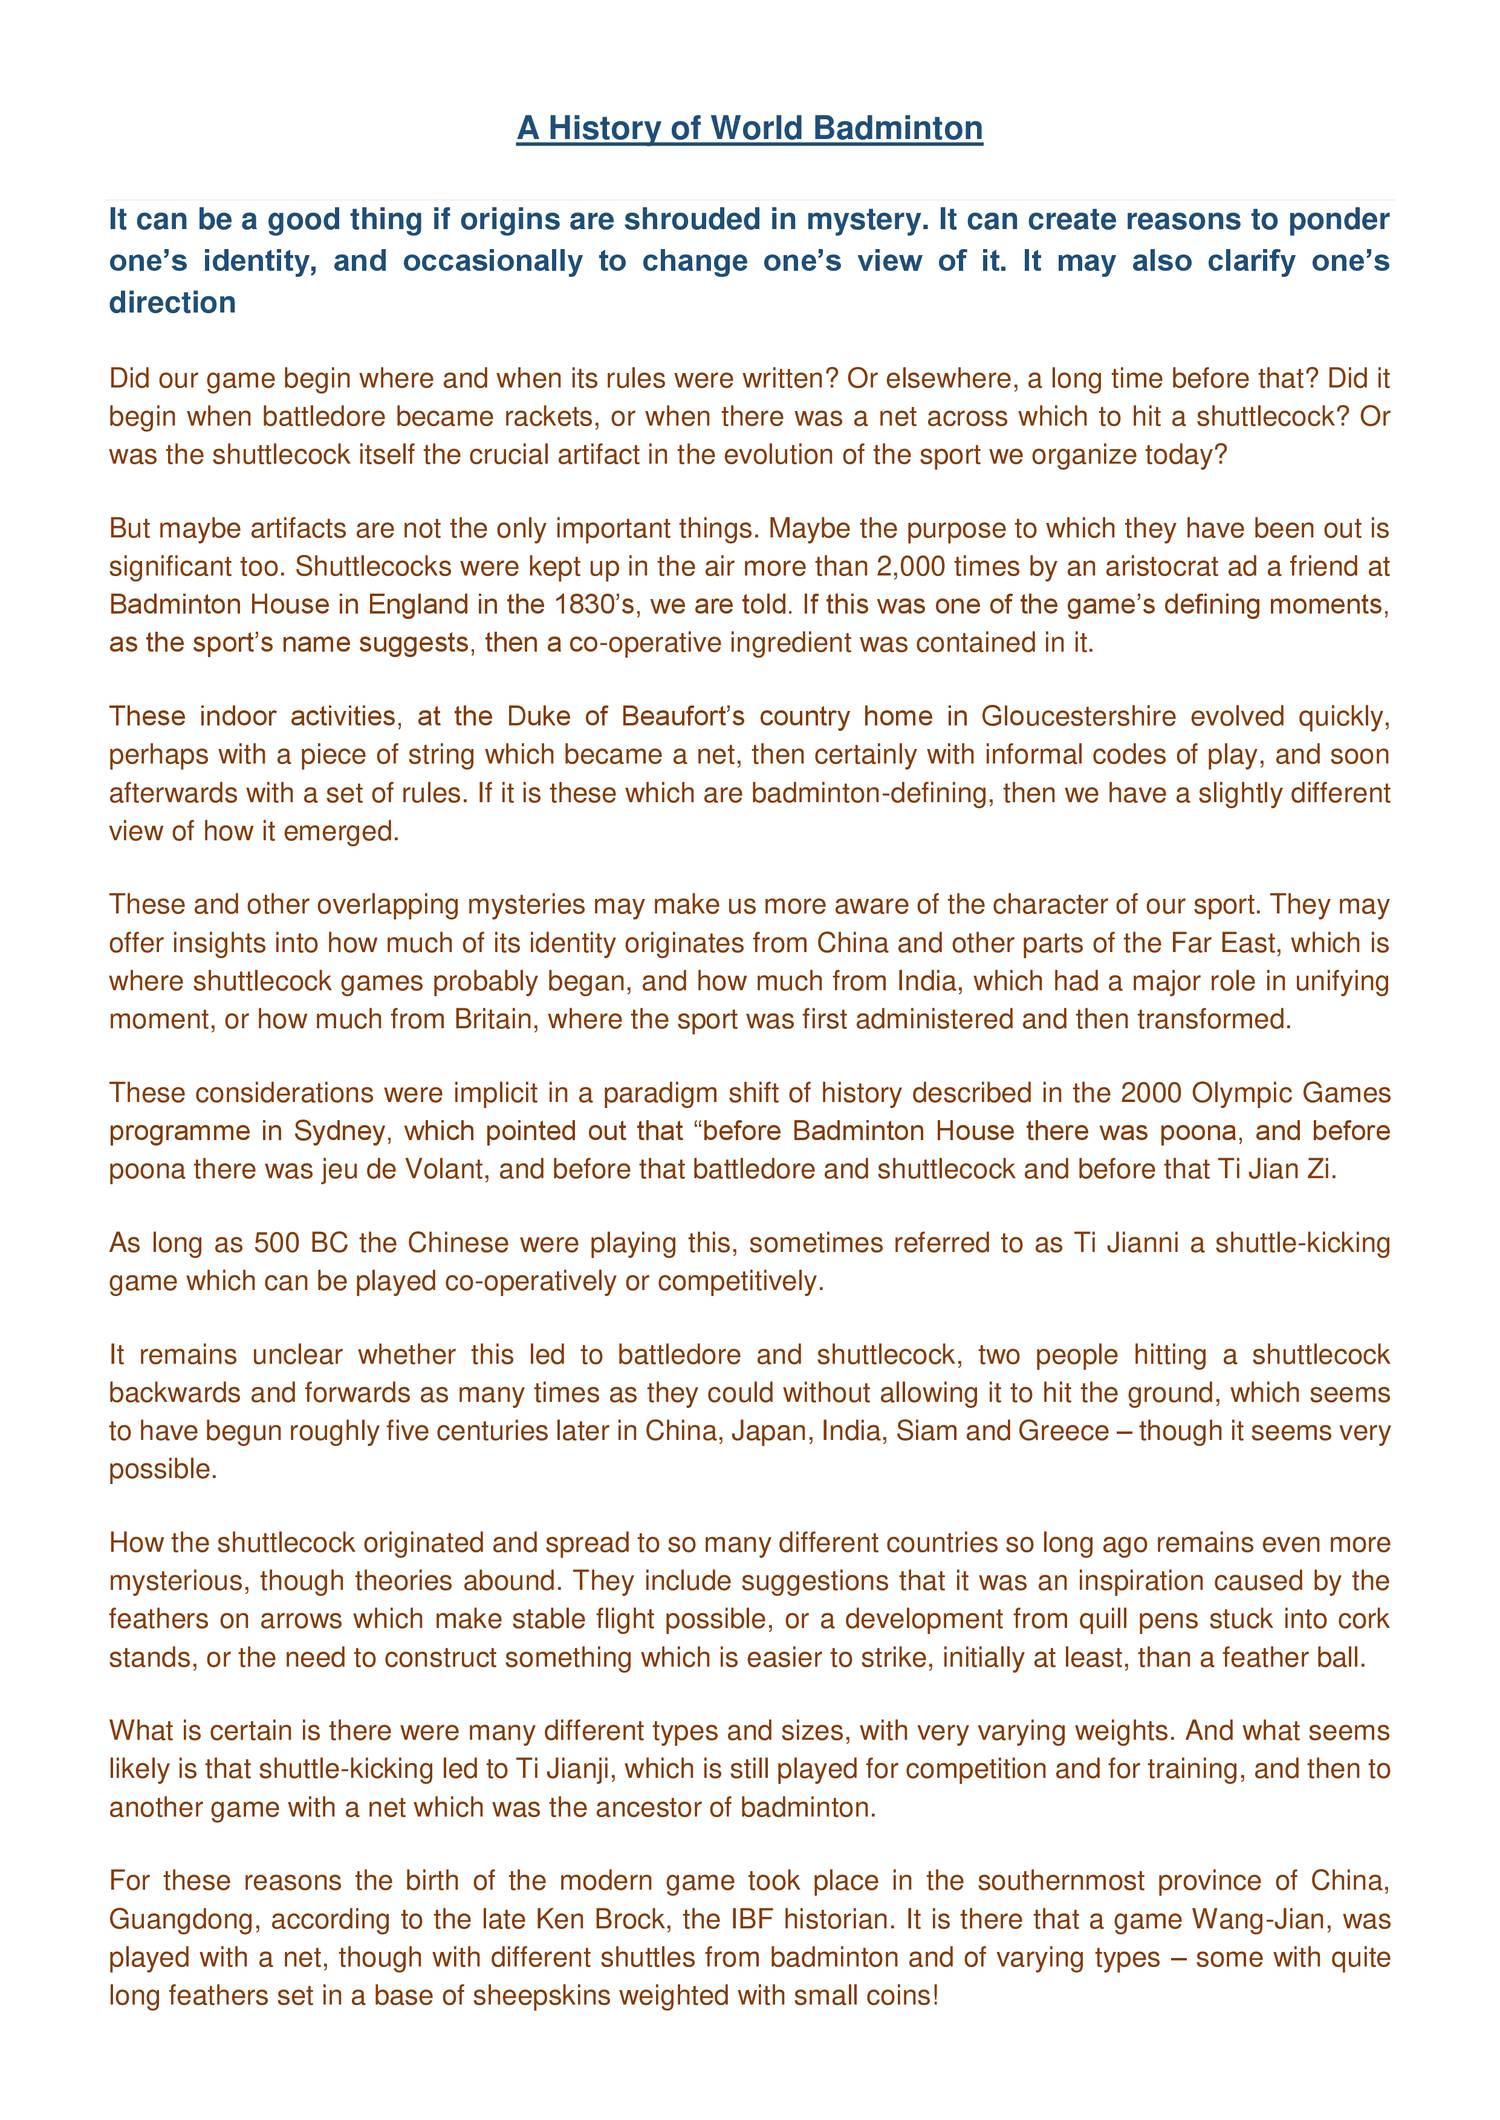 A History of World Badminton pdf | DocDroid